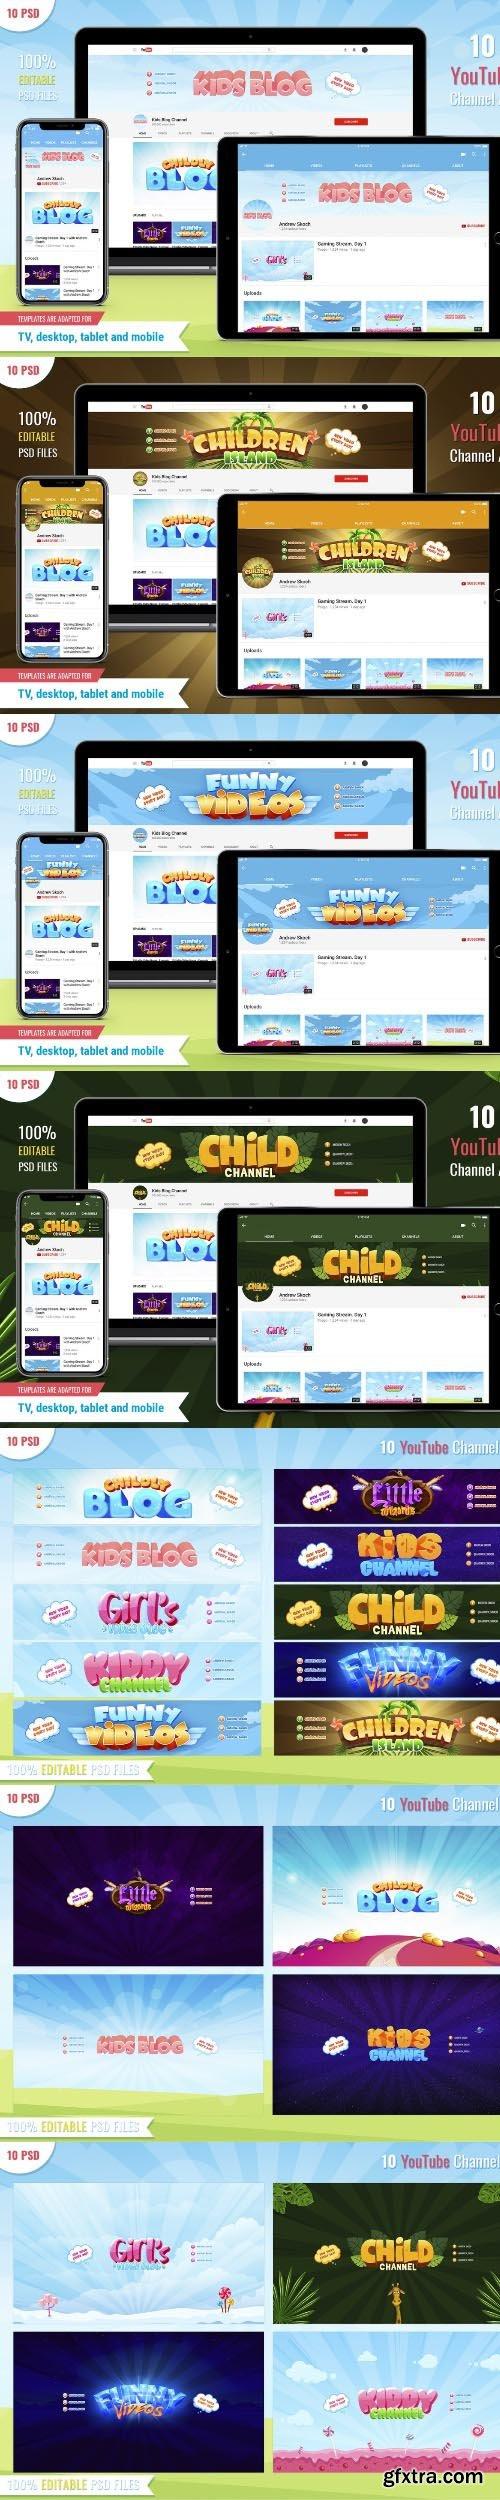 Kid Blog - 10 Youtube Banners